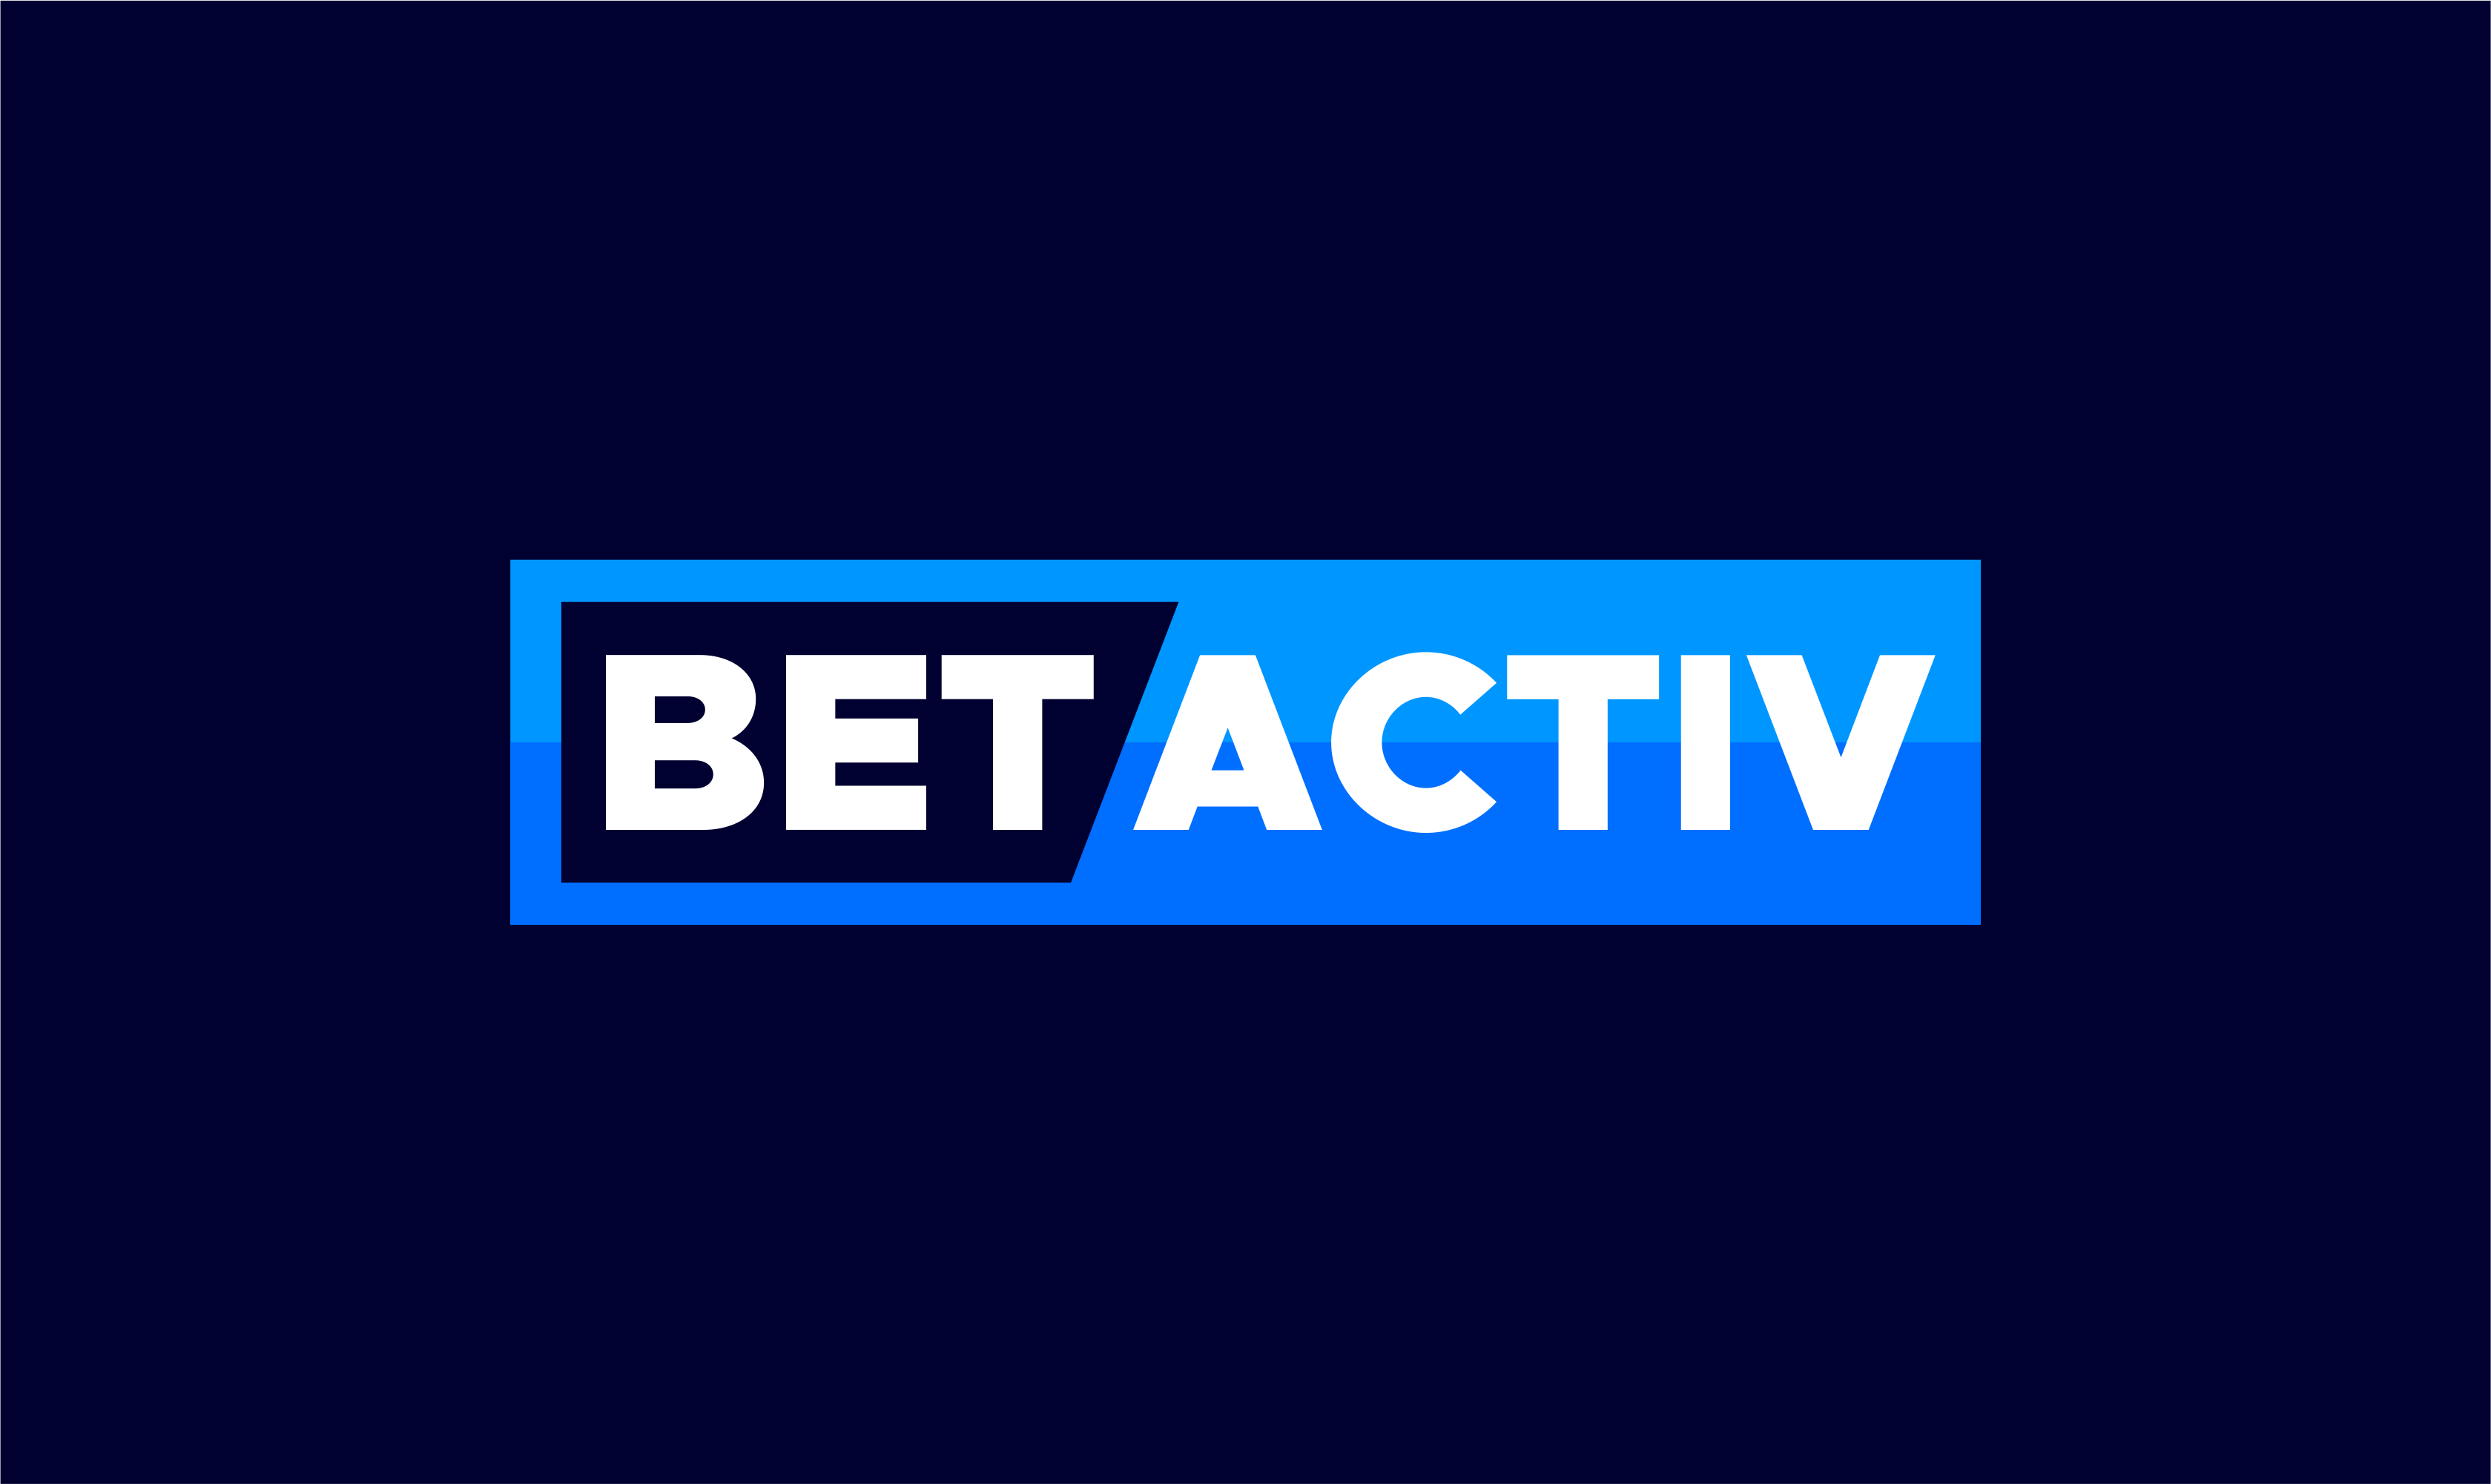 Betactiv - Gambling domain name for sale